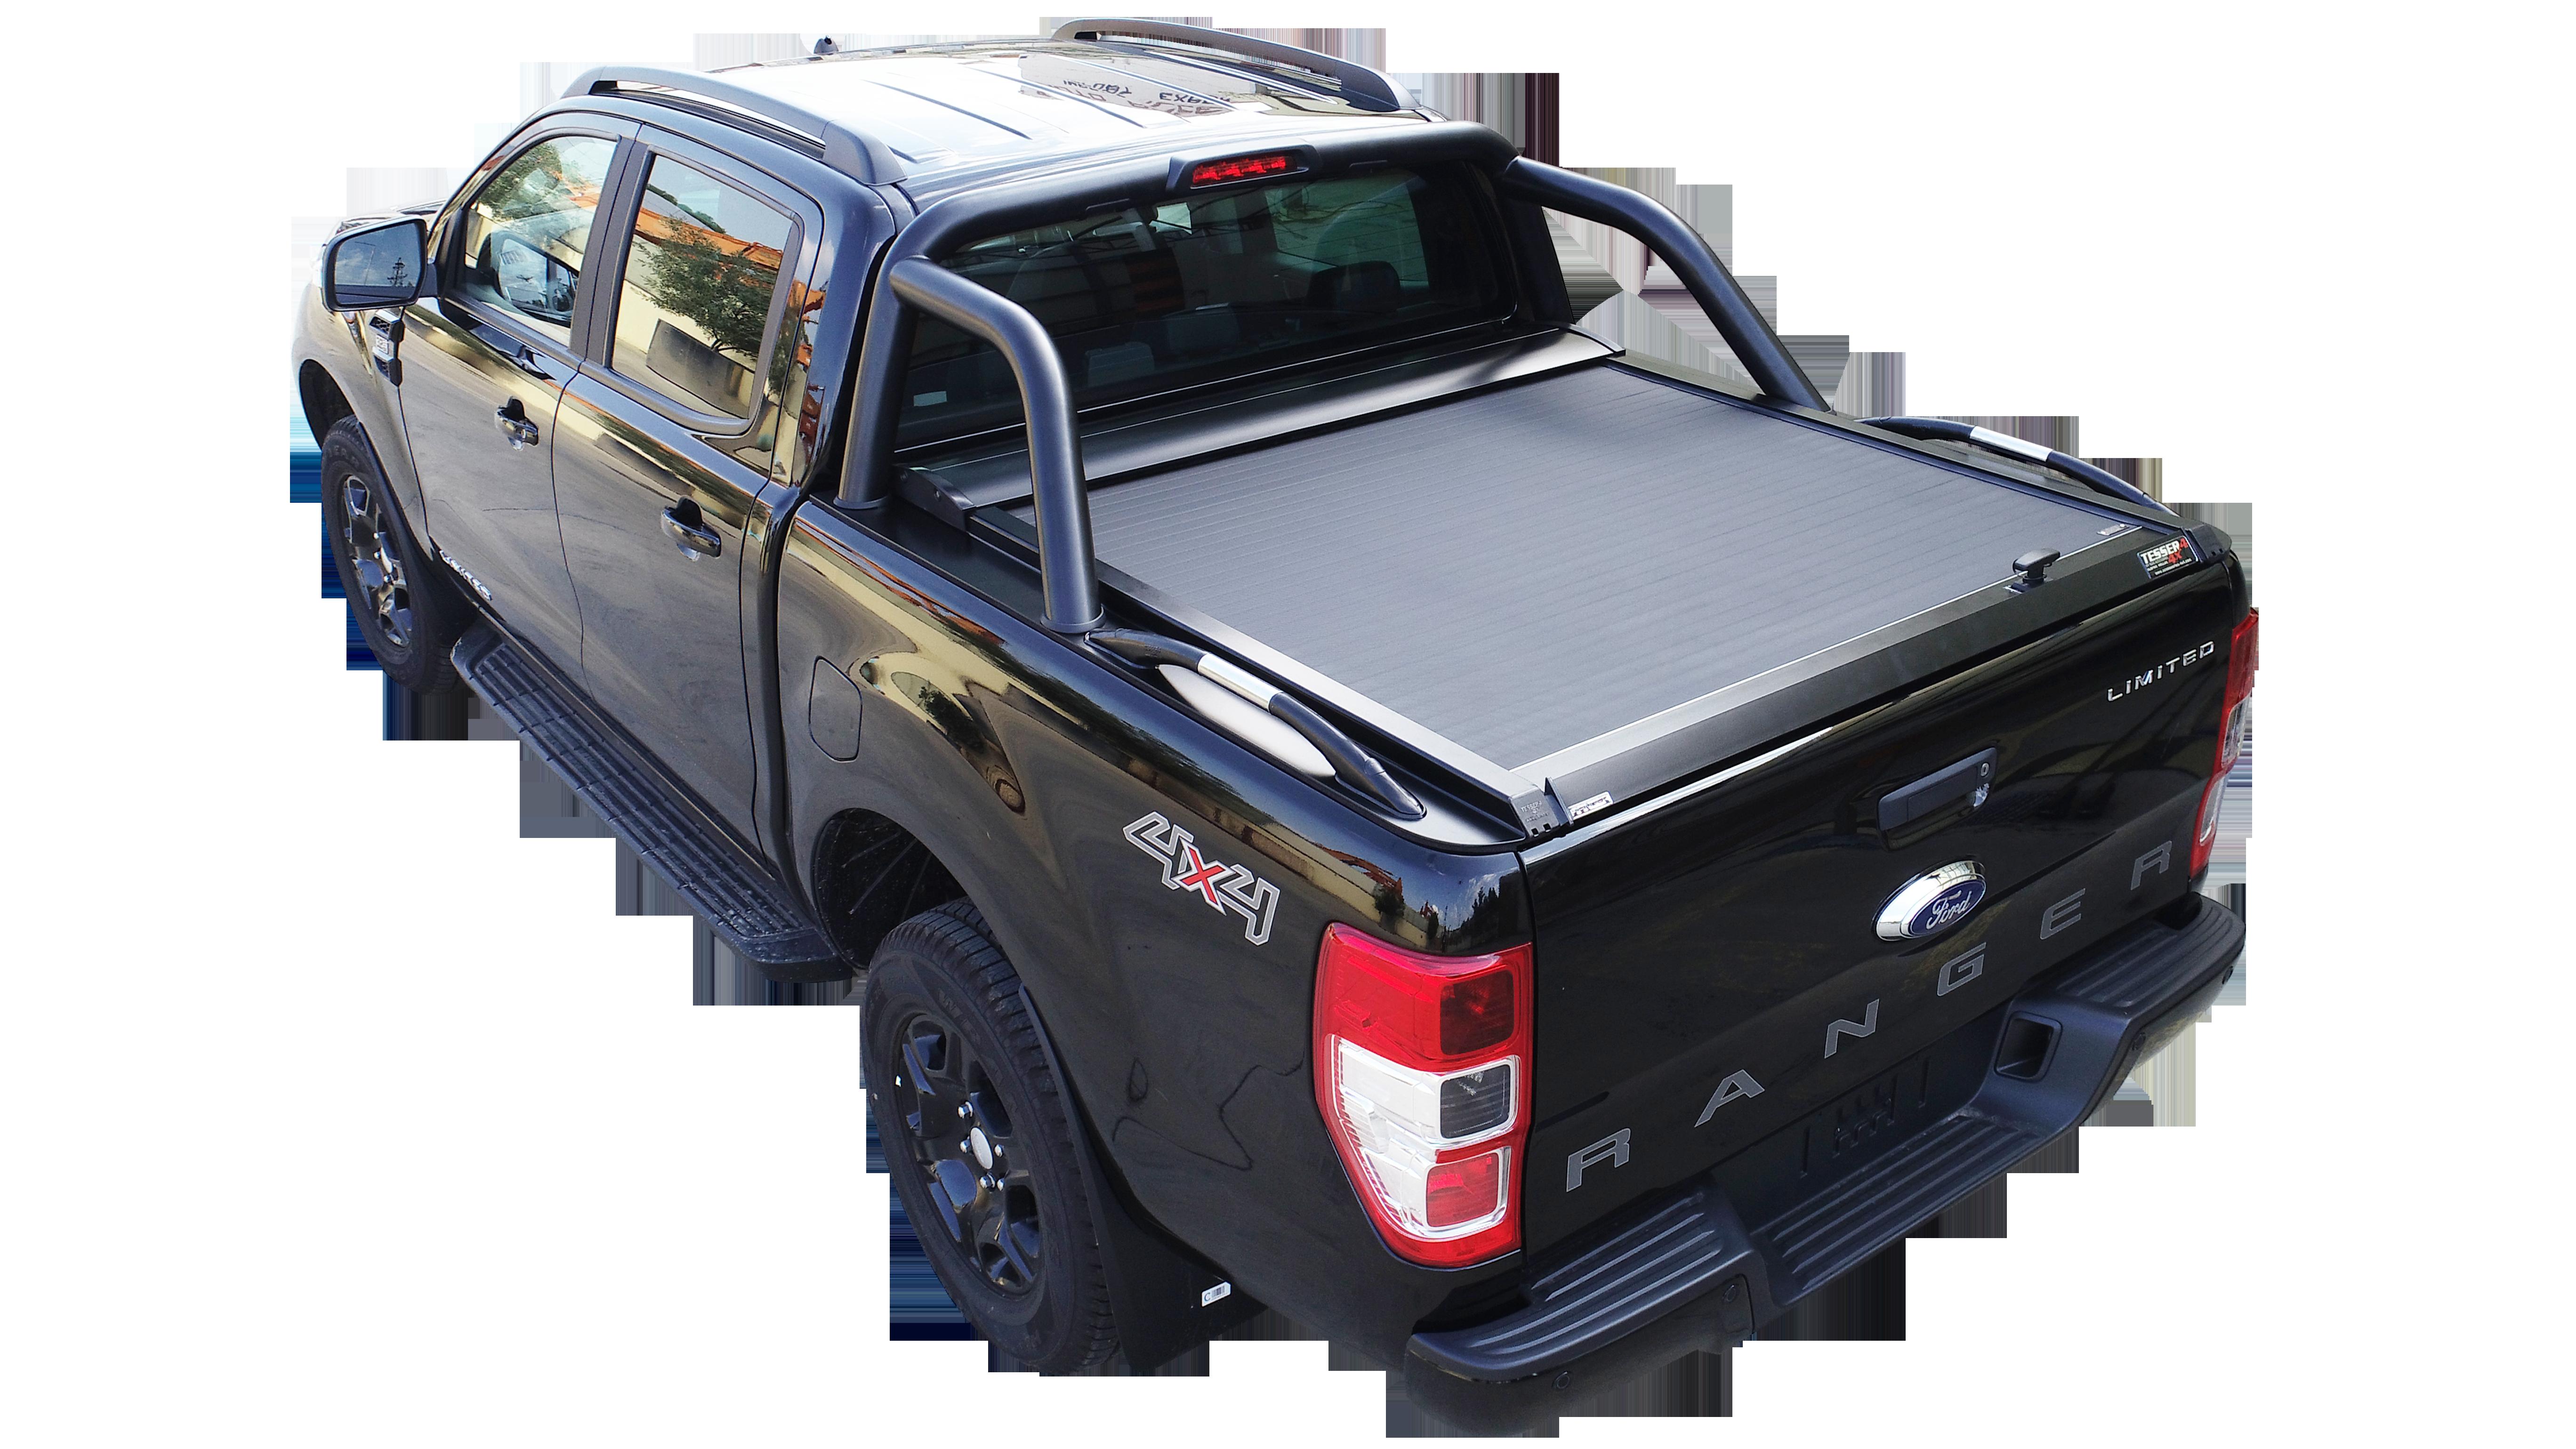 Ford Ranger T6 2012 On Tessera 4x4 Accessories Uk Aluminium